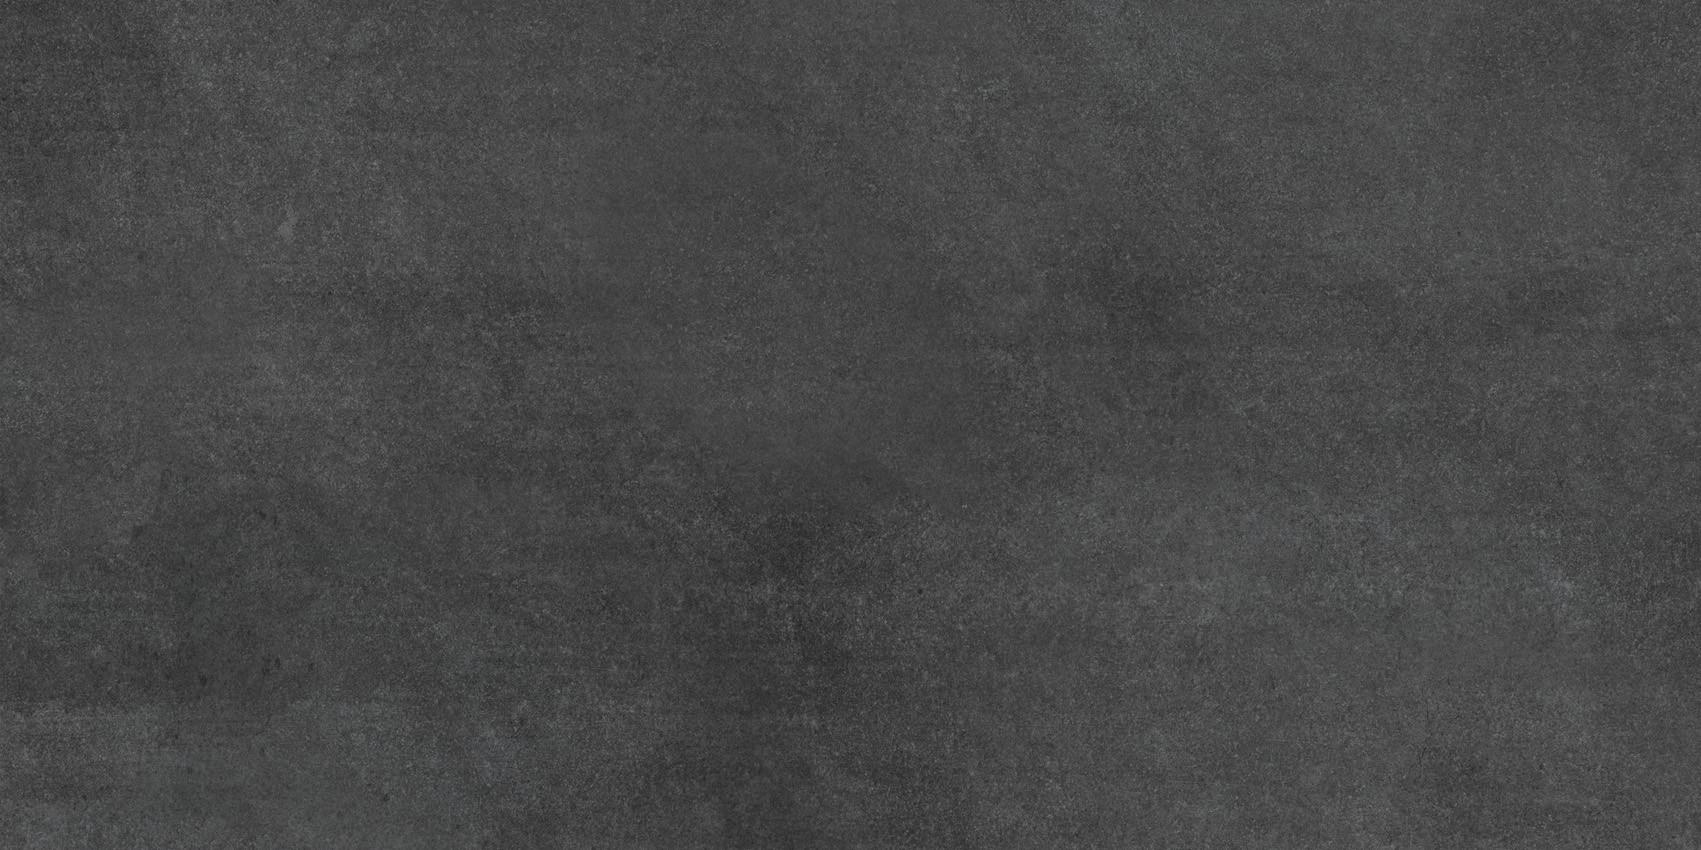 Плитка Пол Shadow Terragres АНТРАЦИТ 30х60